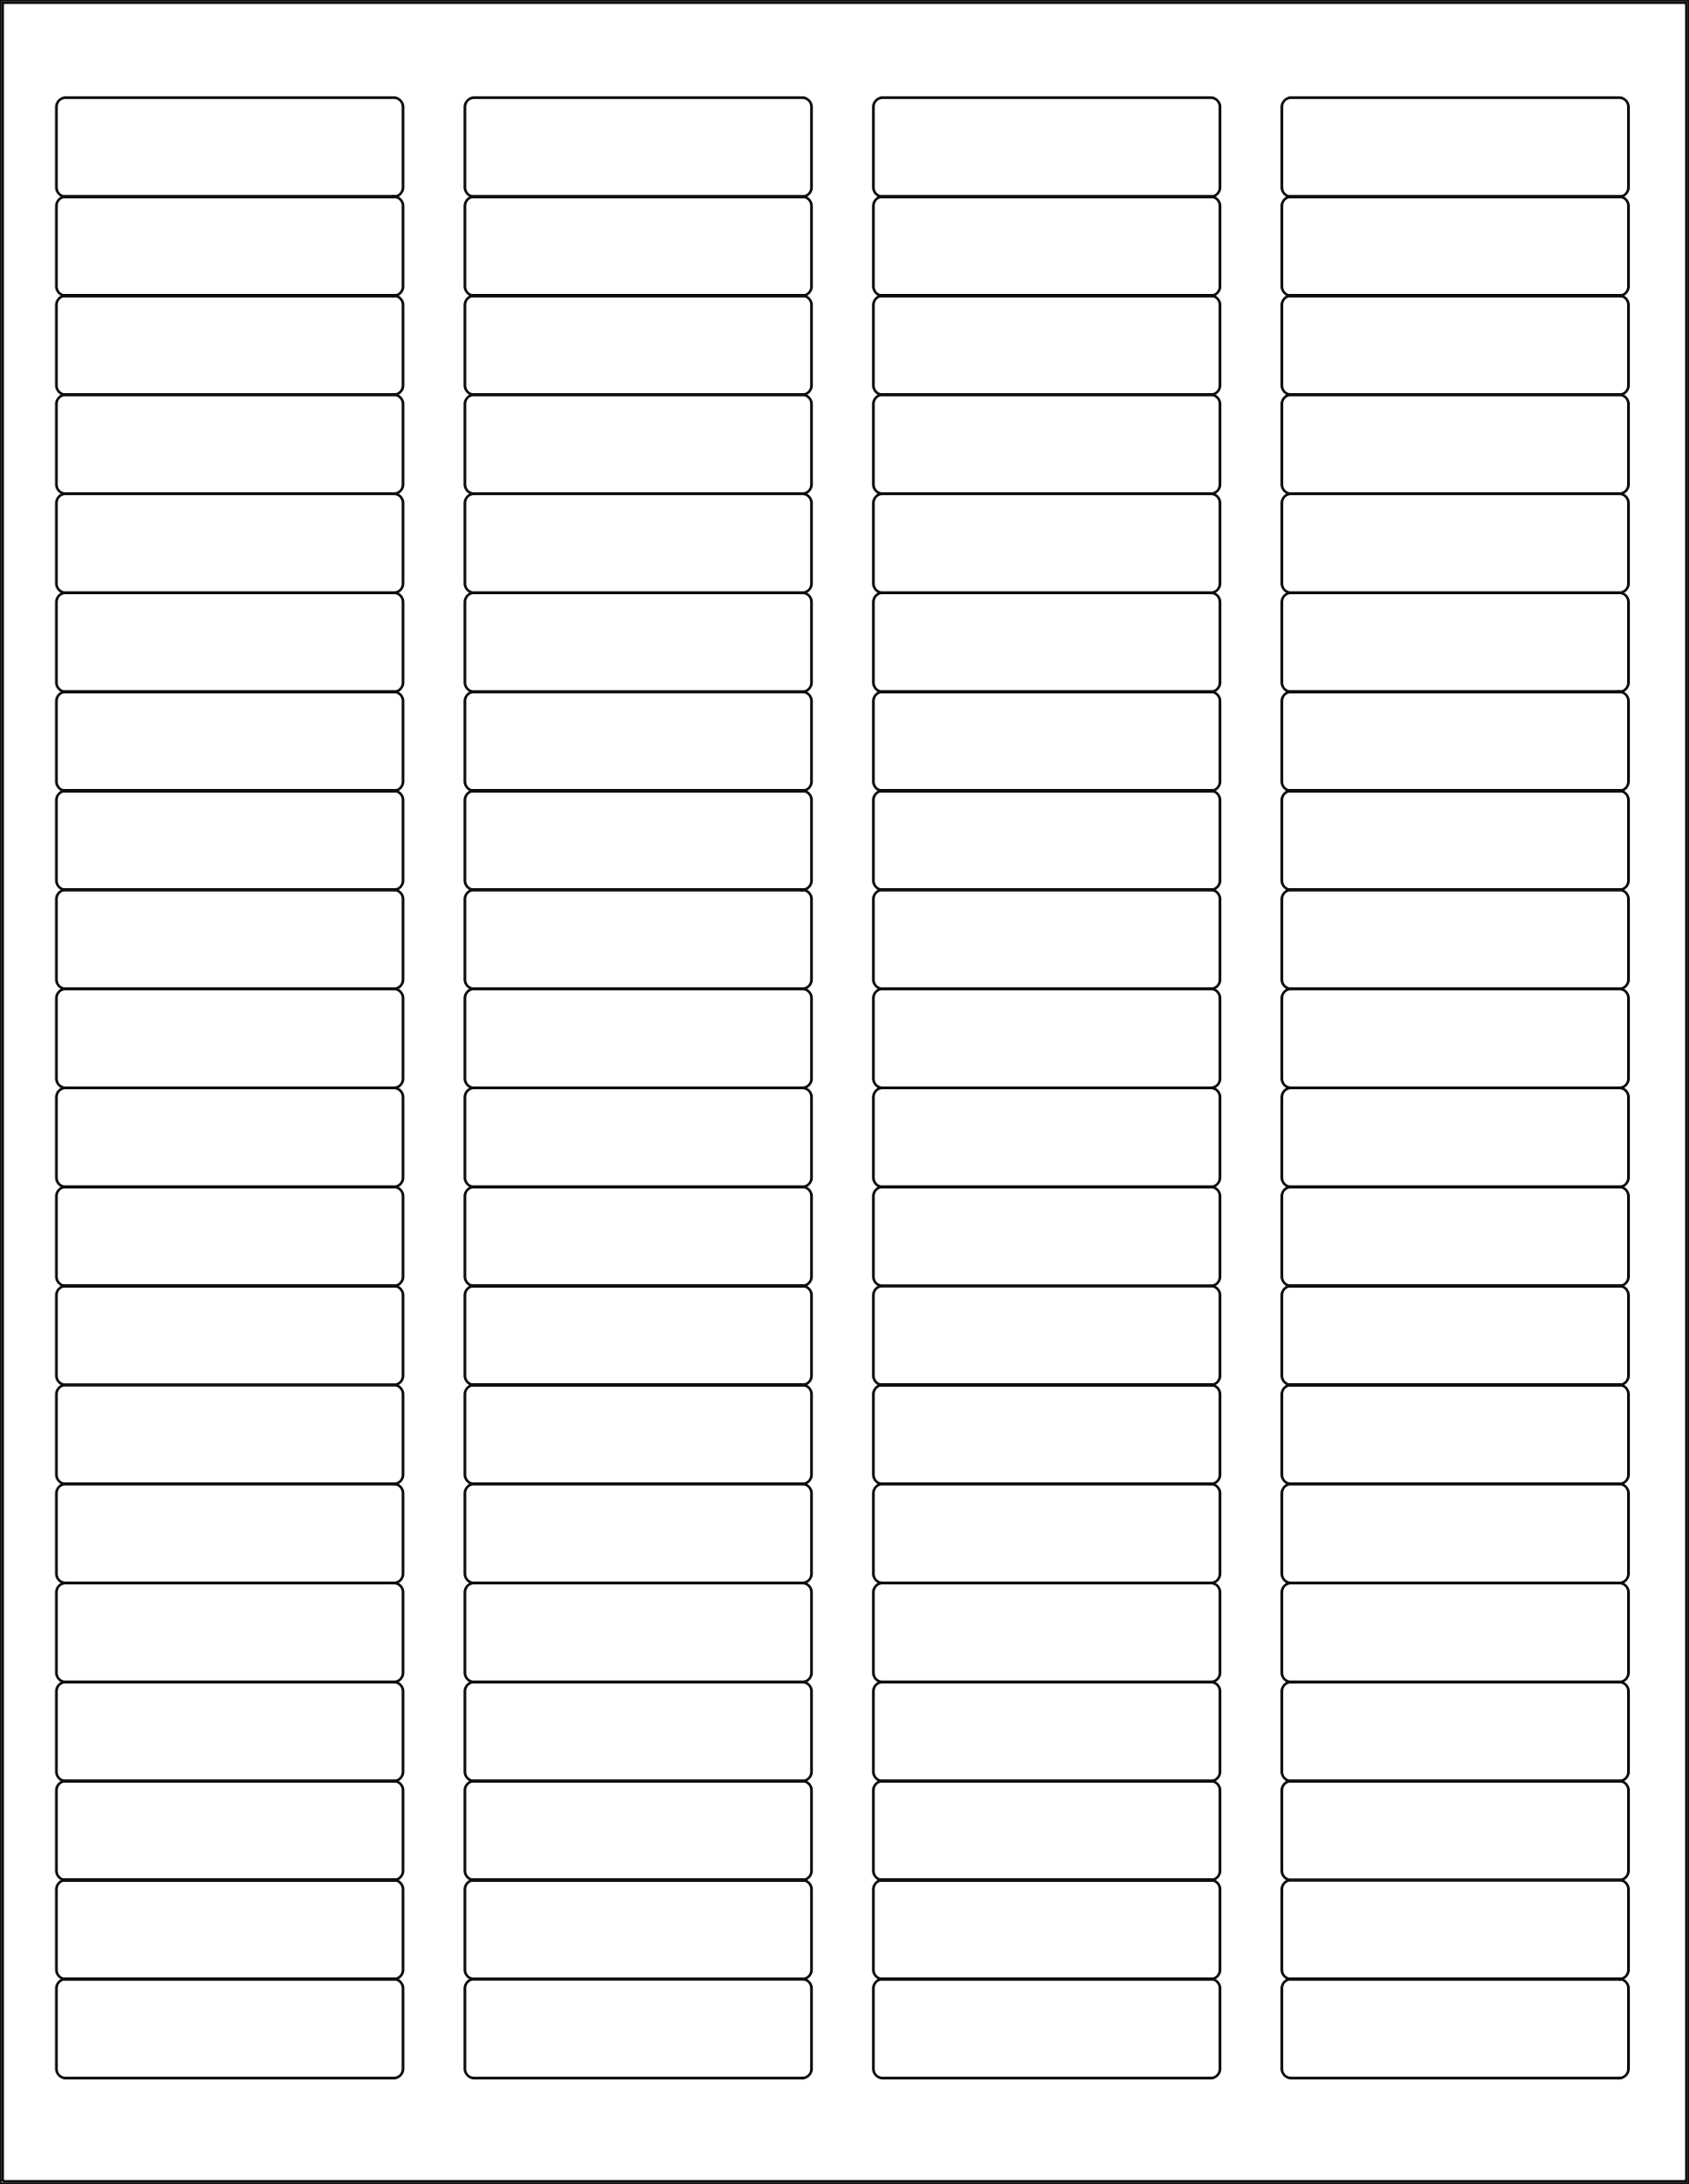 Return Label Templates boatman geller s personalized flat note – Return Labels Template